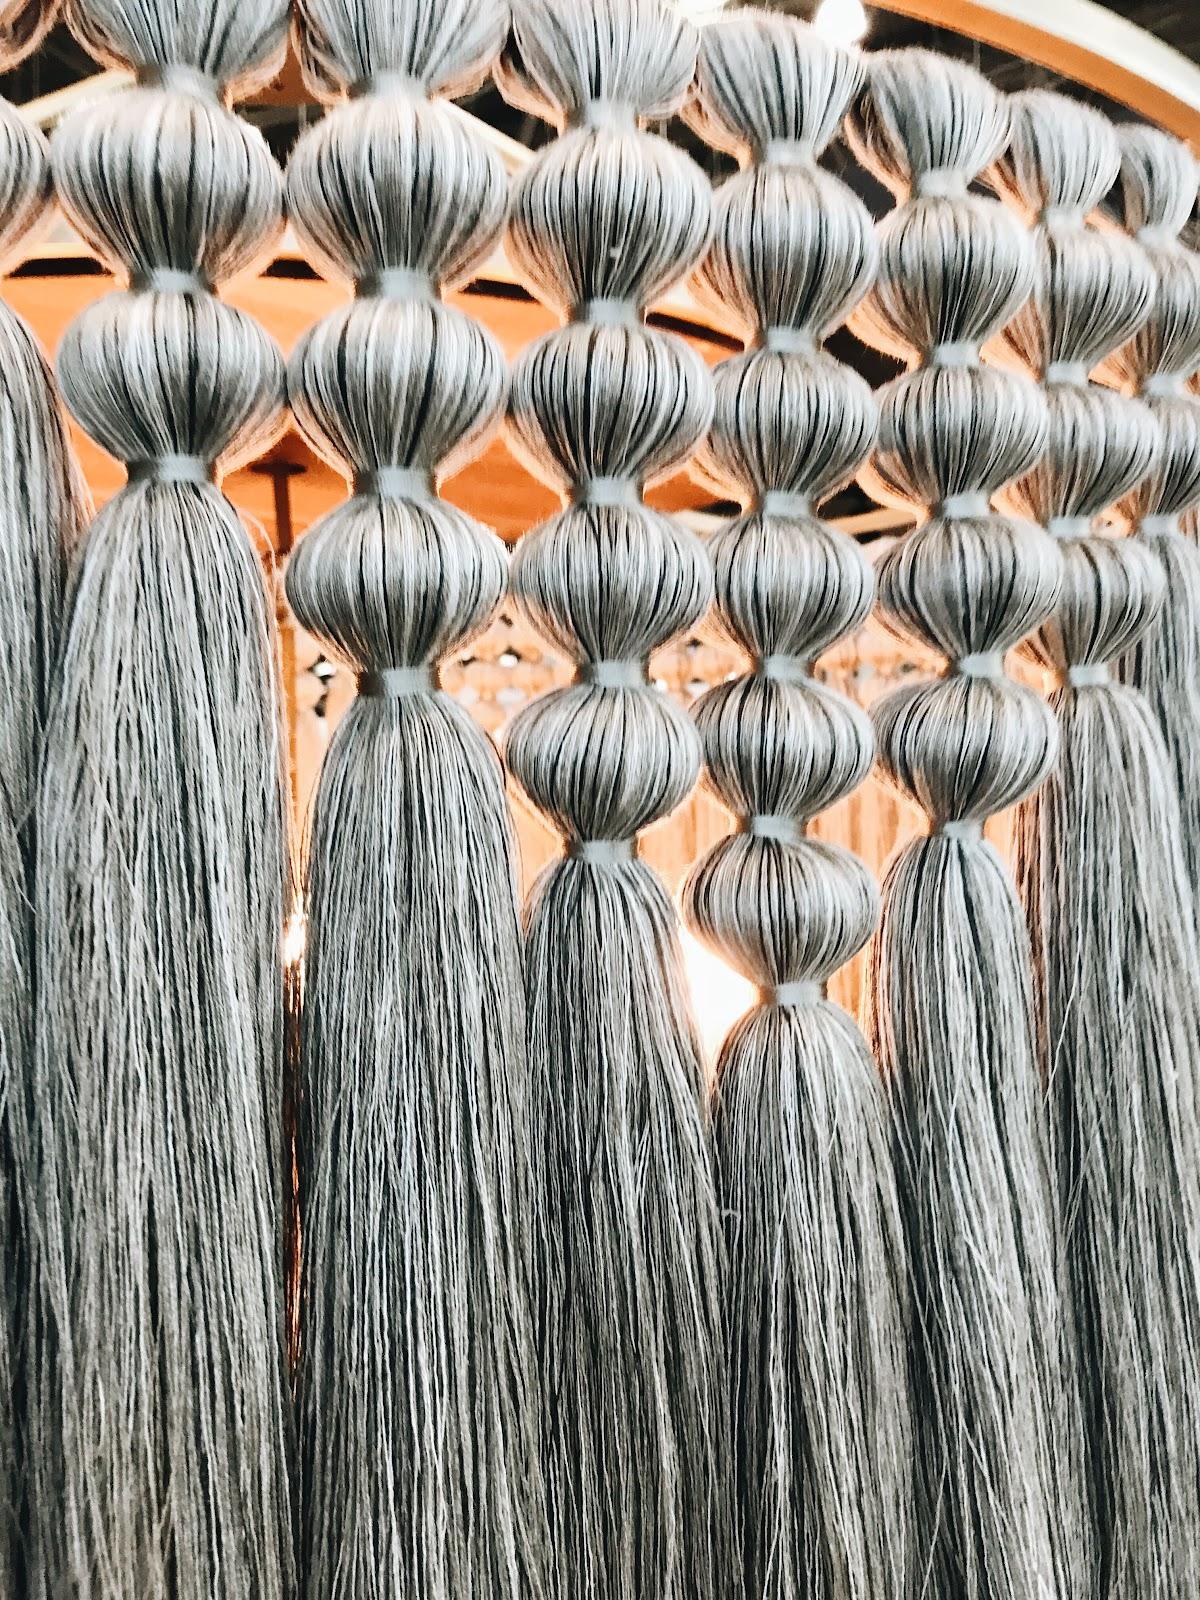 ICFF international contemporary design furniture fair tassels